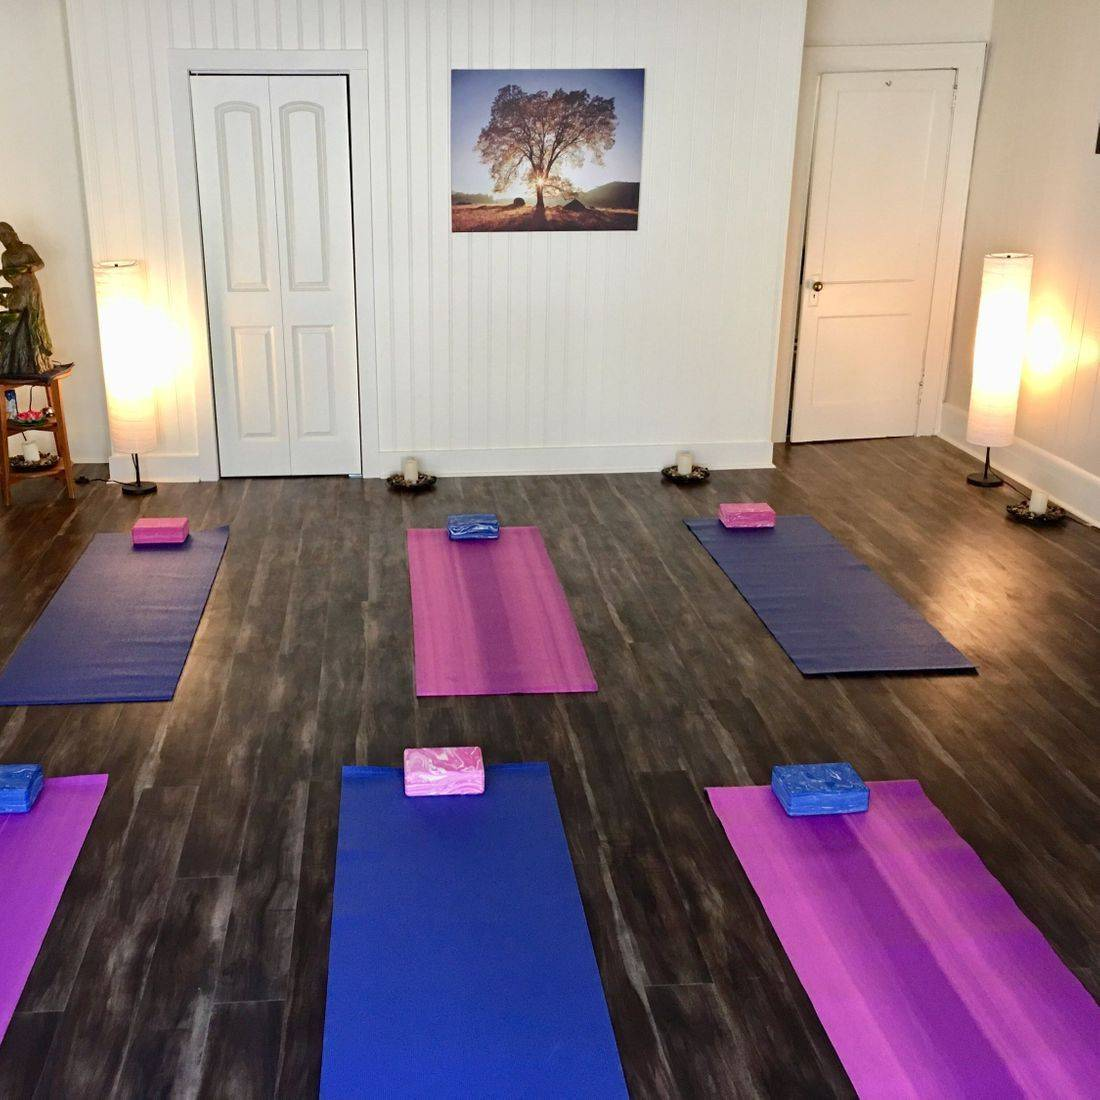 Yoga, Meditation, Earth's Healings, Crystals